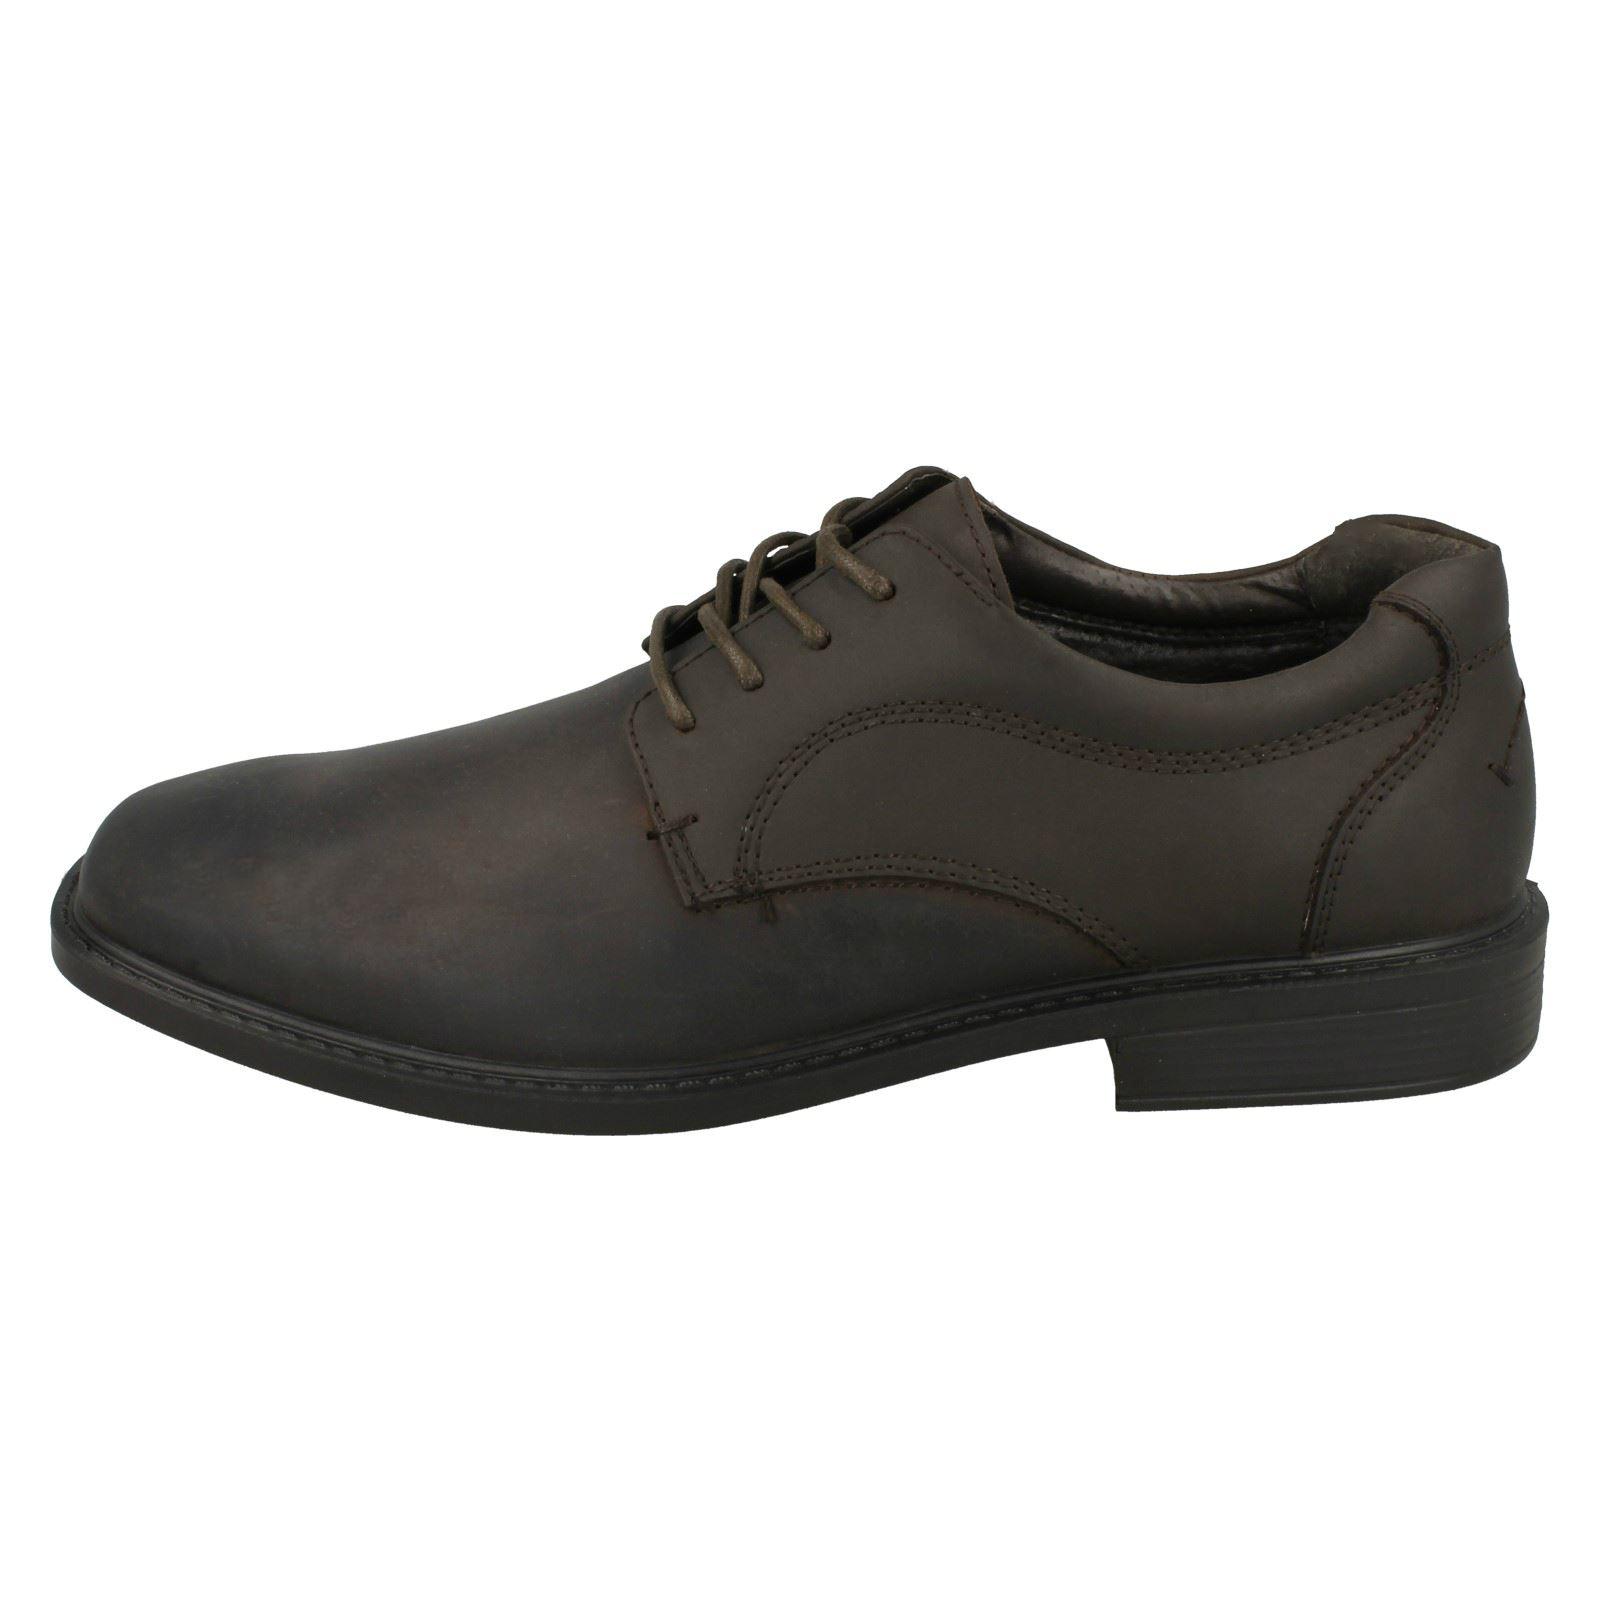 Hombres Zapatos Hush Puppies formal Norwich